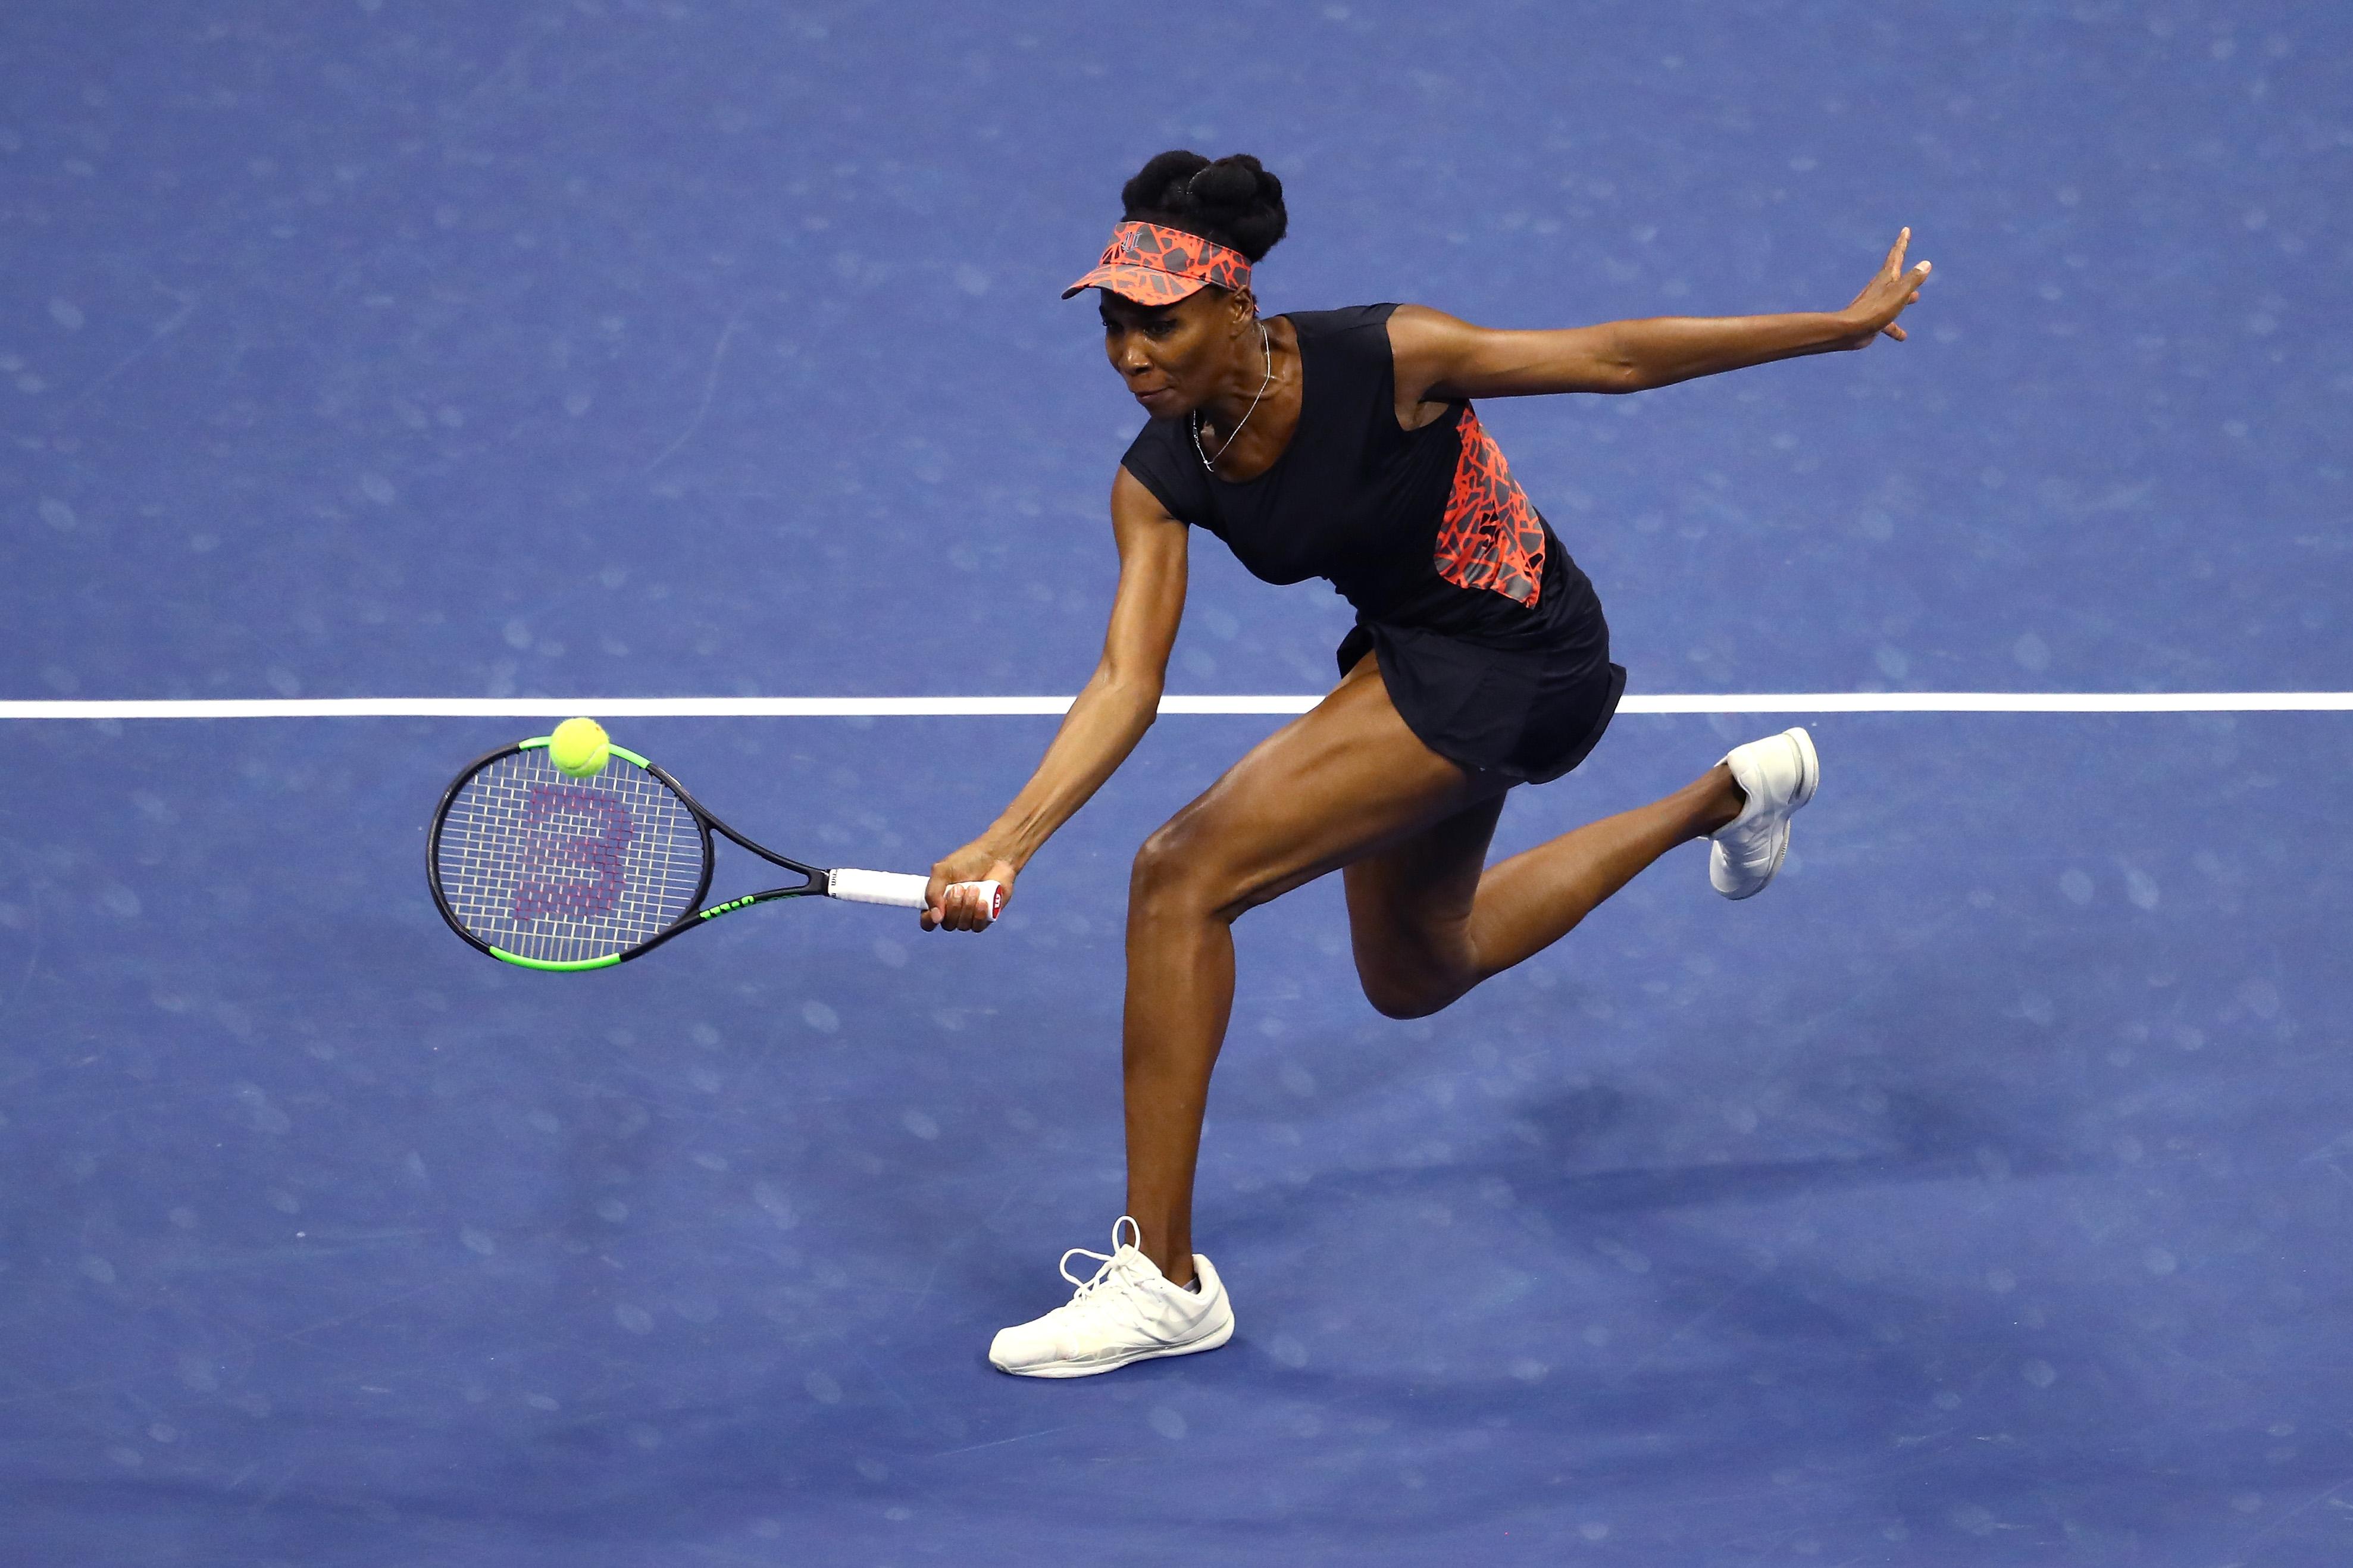 Singapur Tennis